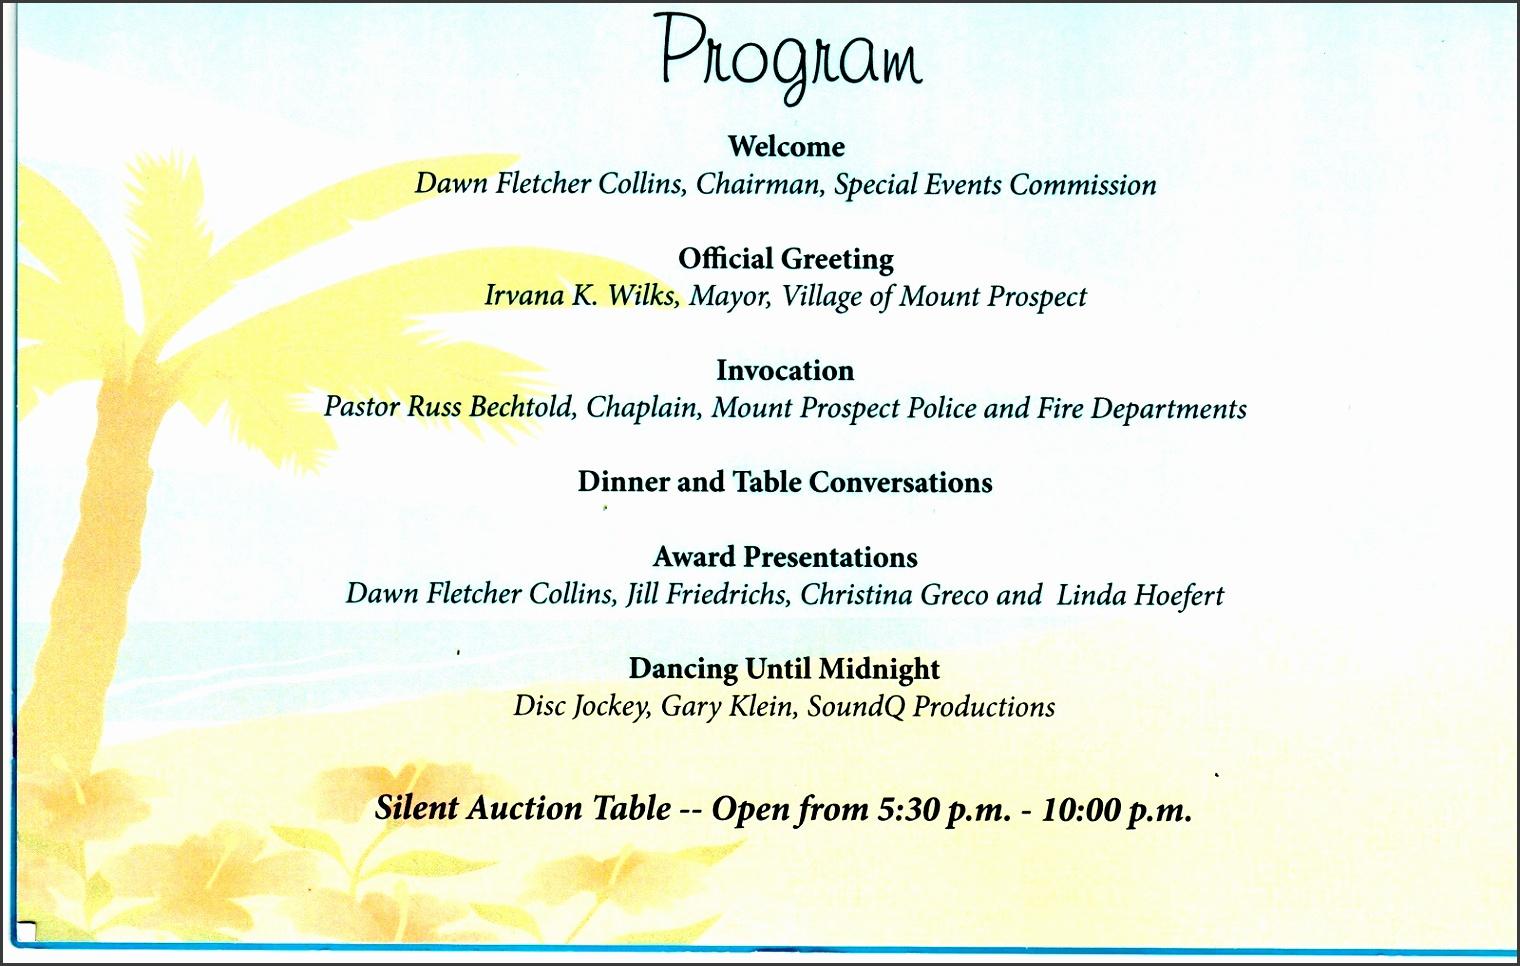 8 Corporate Event Program Template SampleTemplatess